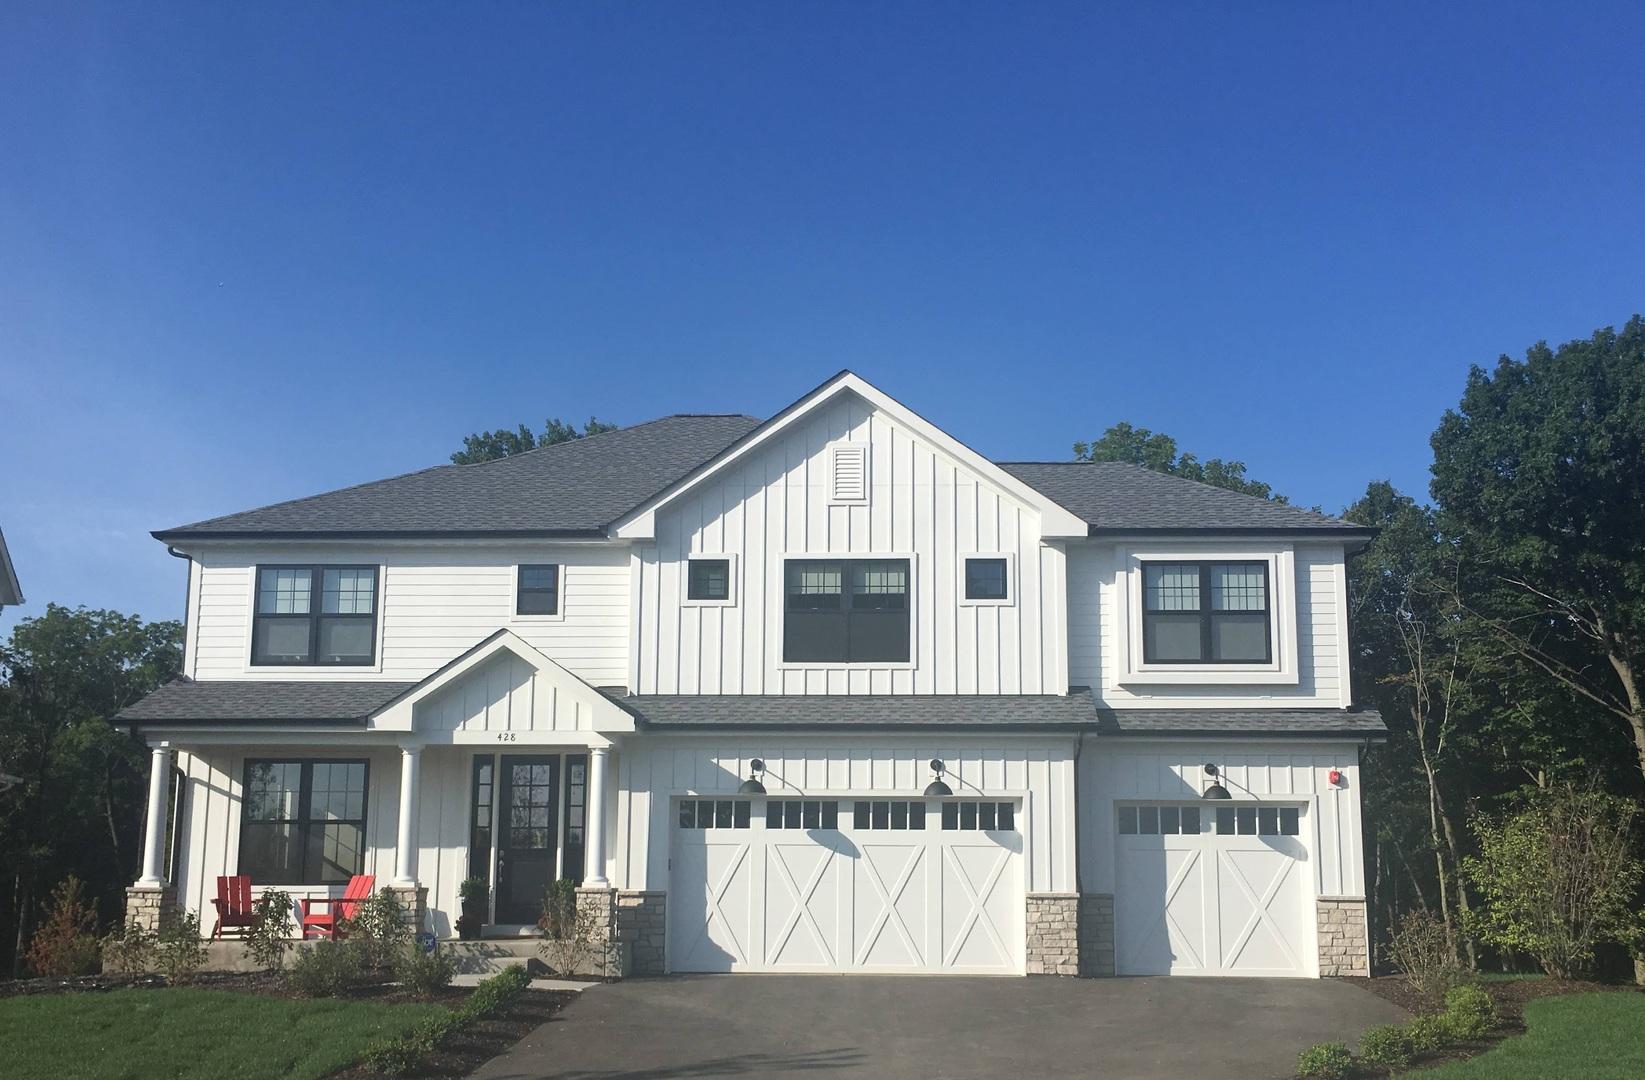 428 Woodland Chase Lane, Vernon Hills IL 60061